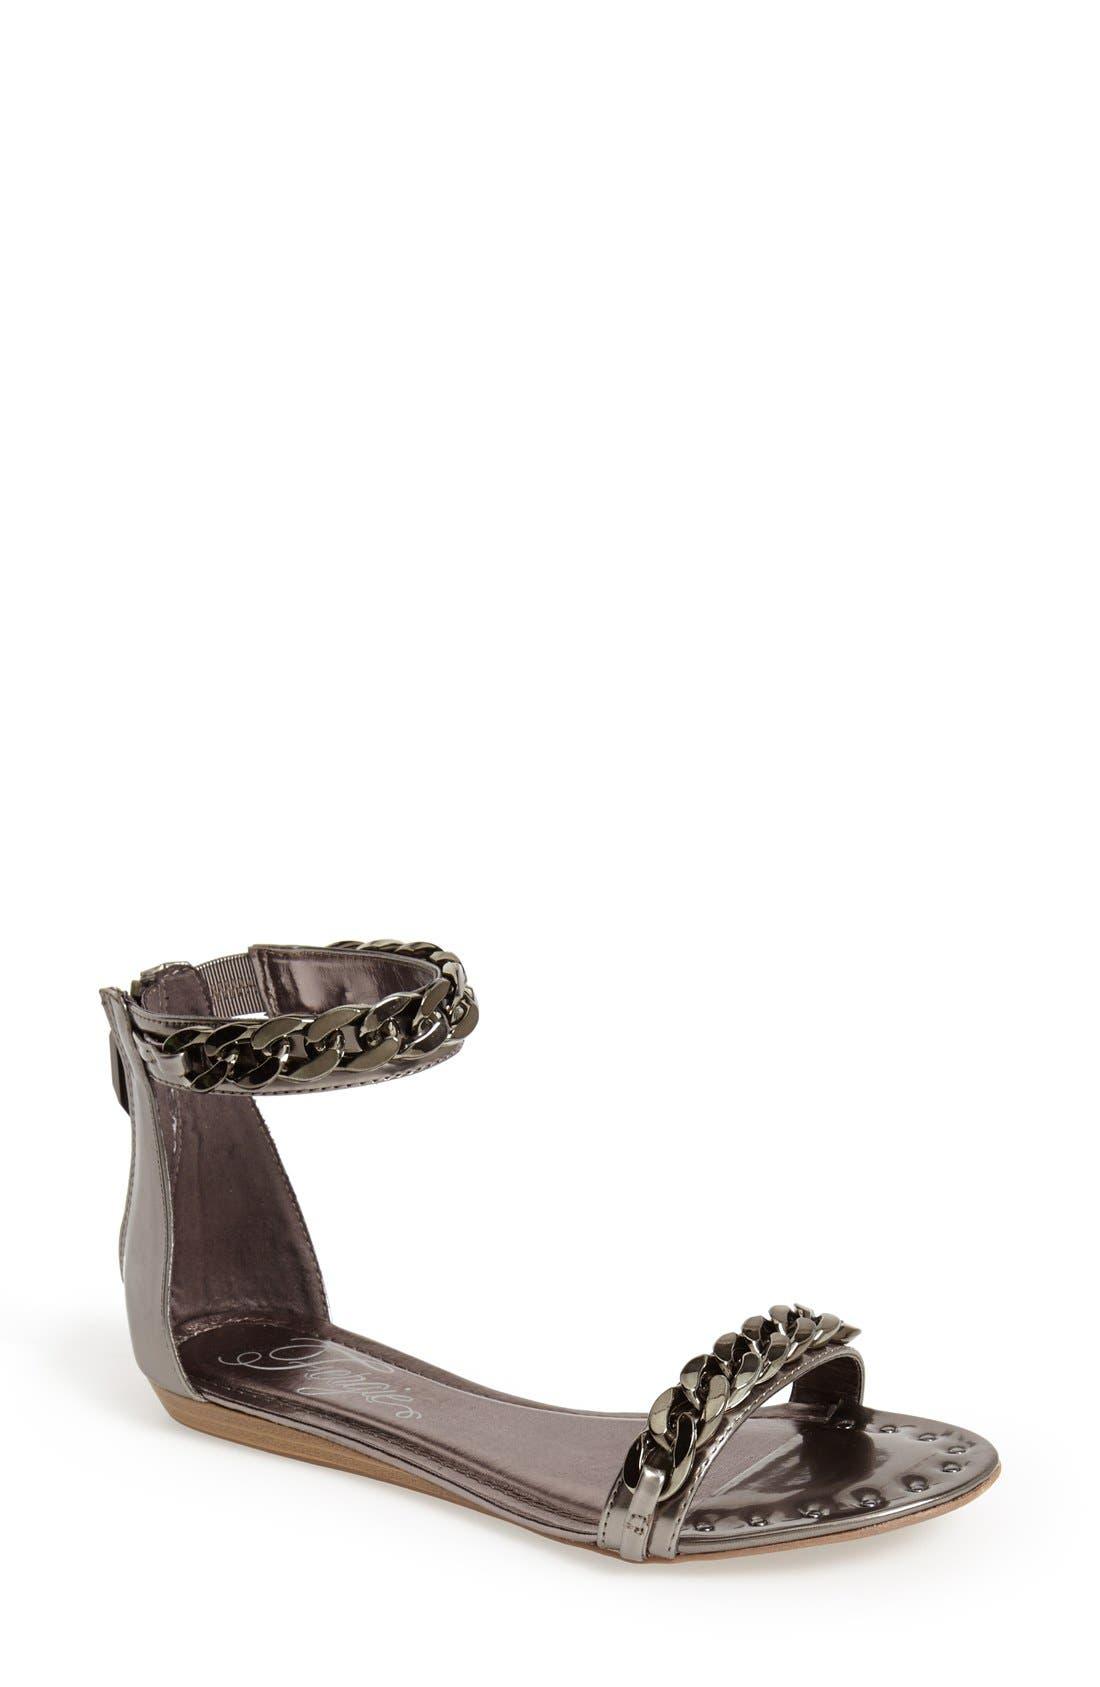 Alternate Image 1 Selected - Fergie 'Grind' Sandal (Women)